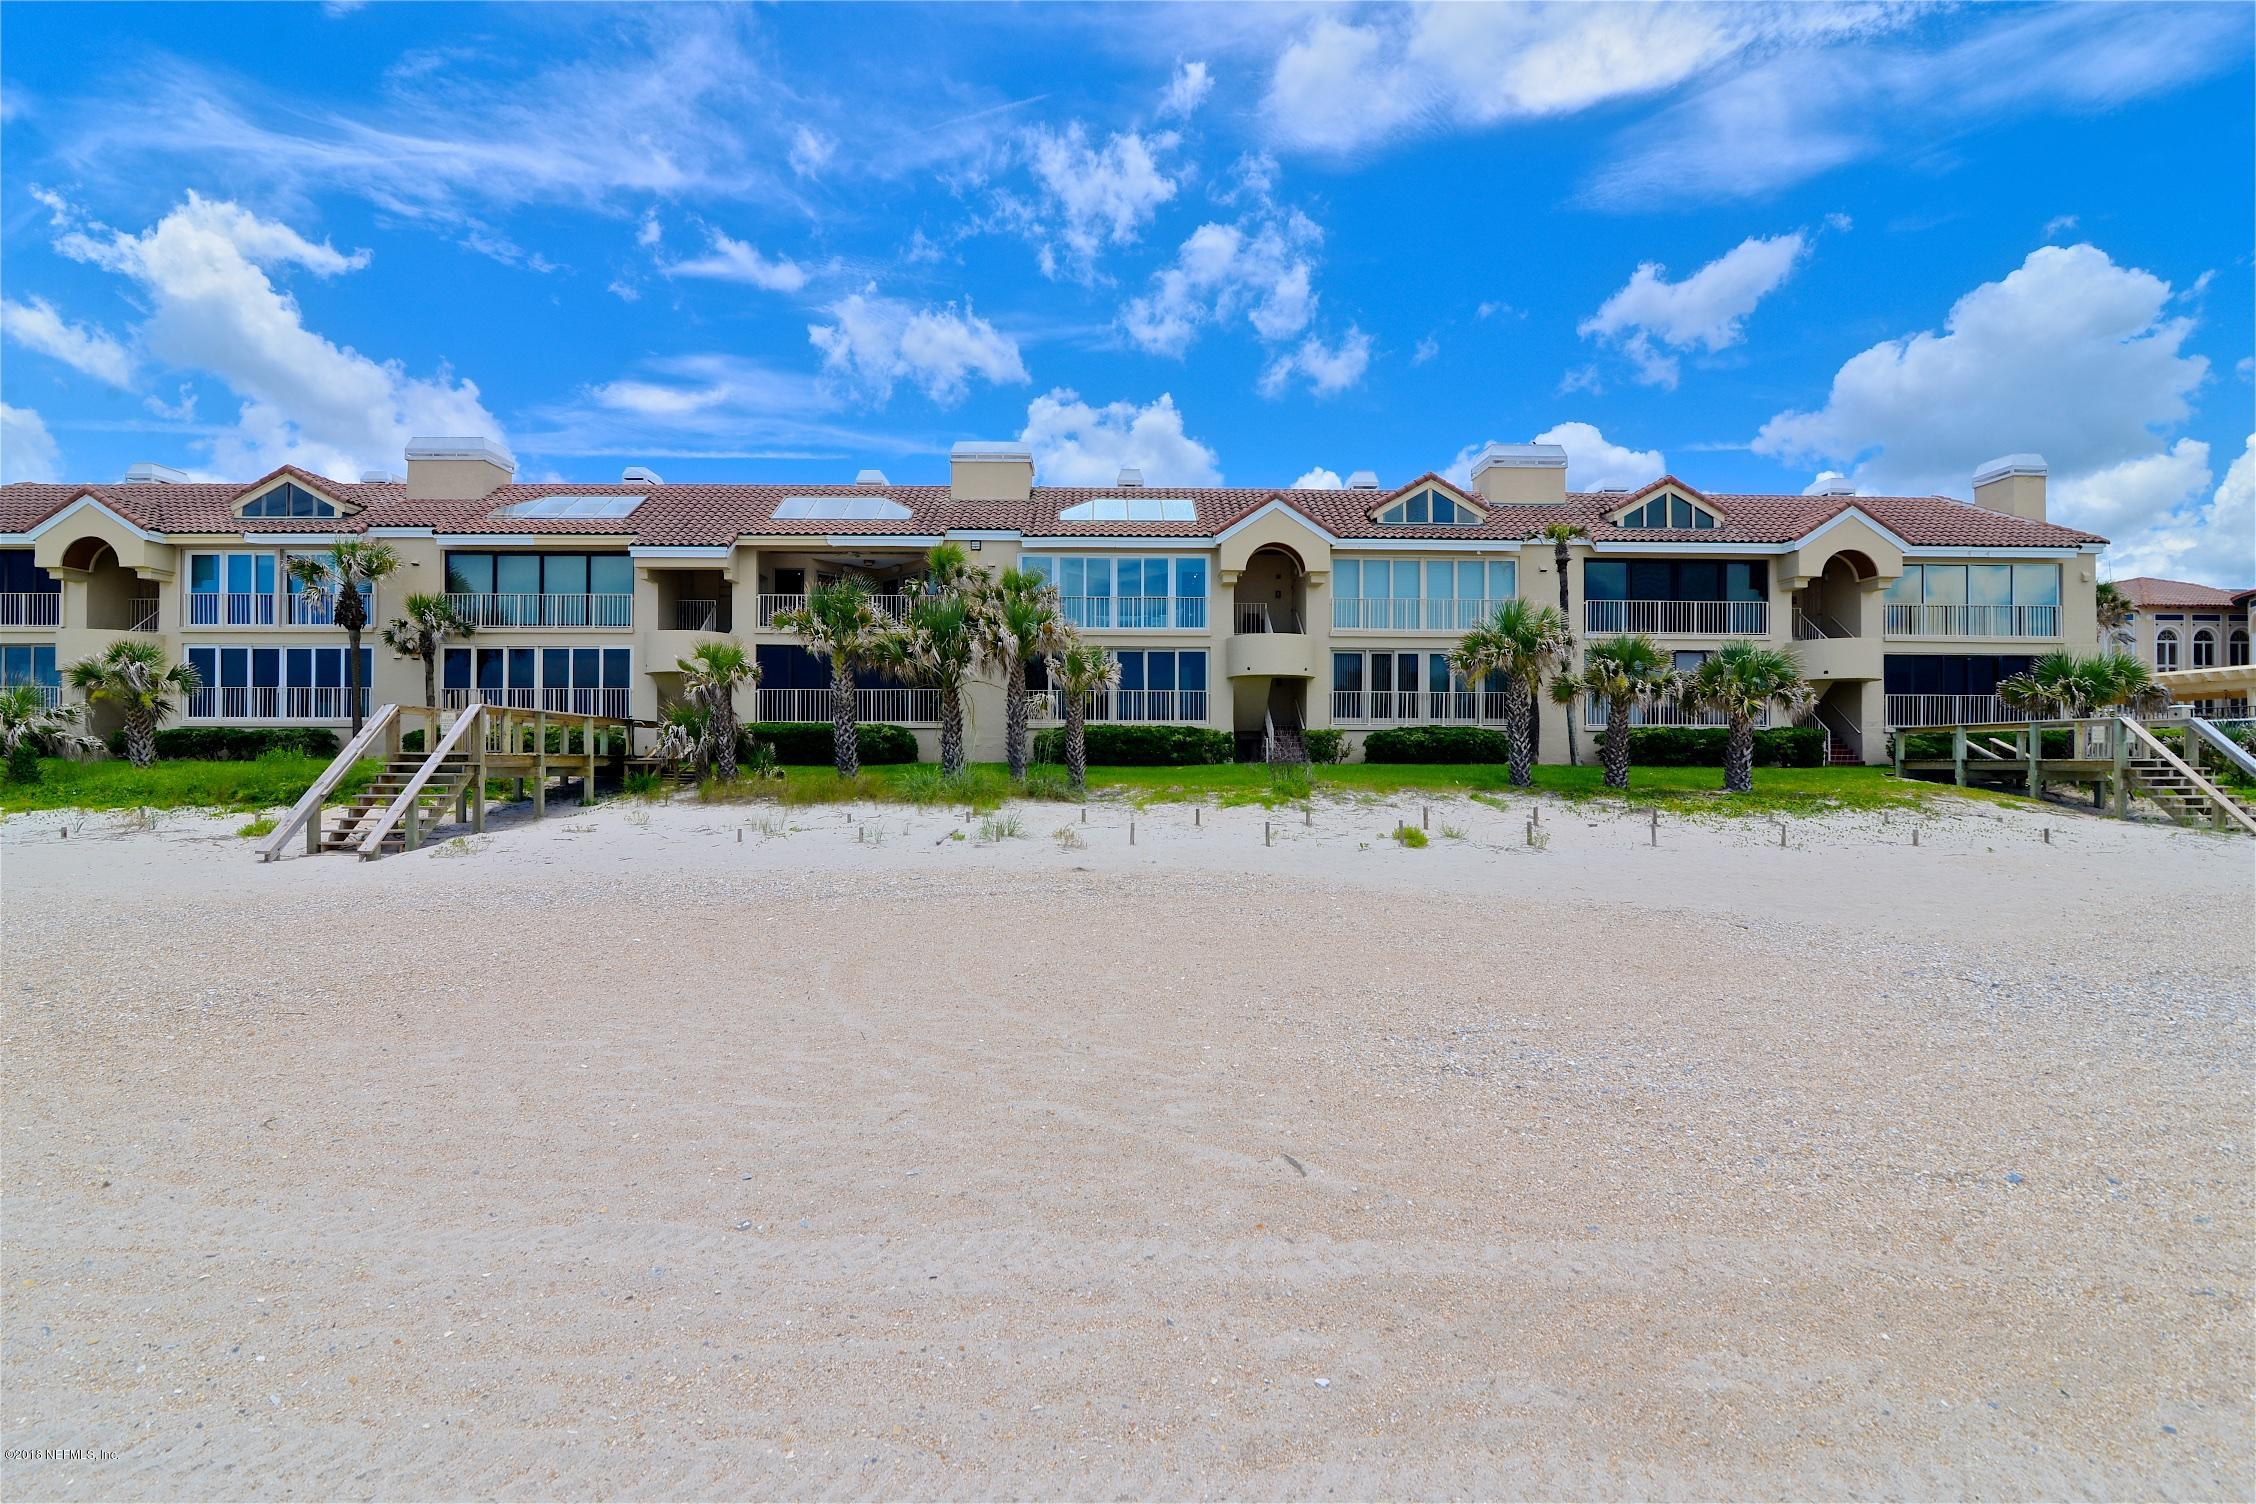 611 PONTE VEDRA, PONTE VEDRA BEACH, FLORIDA 32082, 3 Bedrooms Bedrooms, ,3 BathroomsBathrooms,Residential - condos/townhomes,For sale,PONTE VEDRA,971021